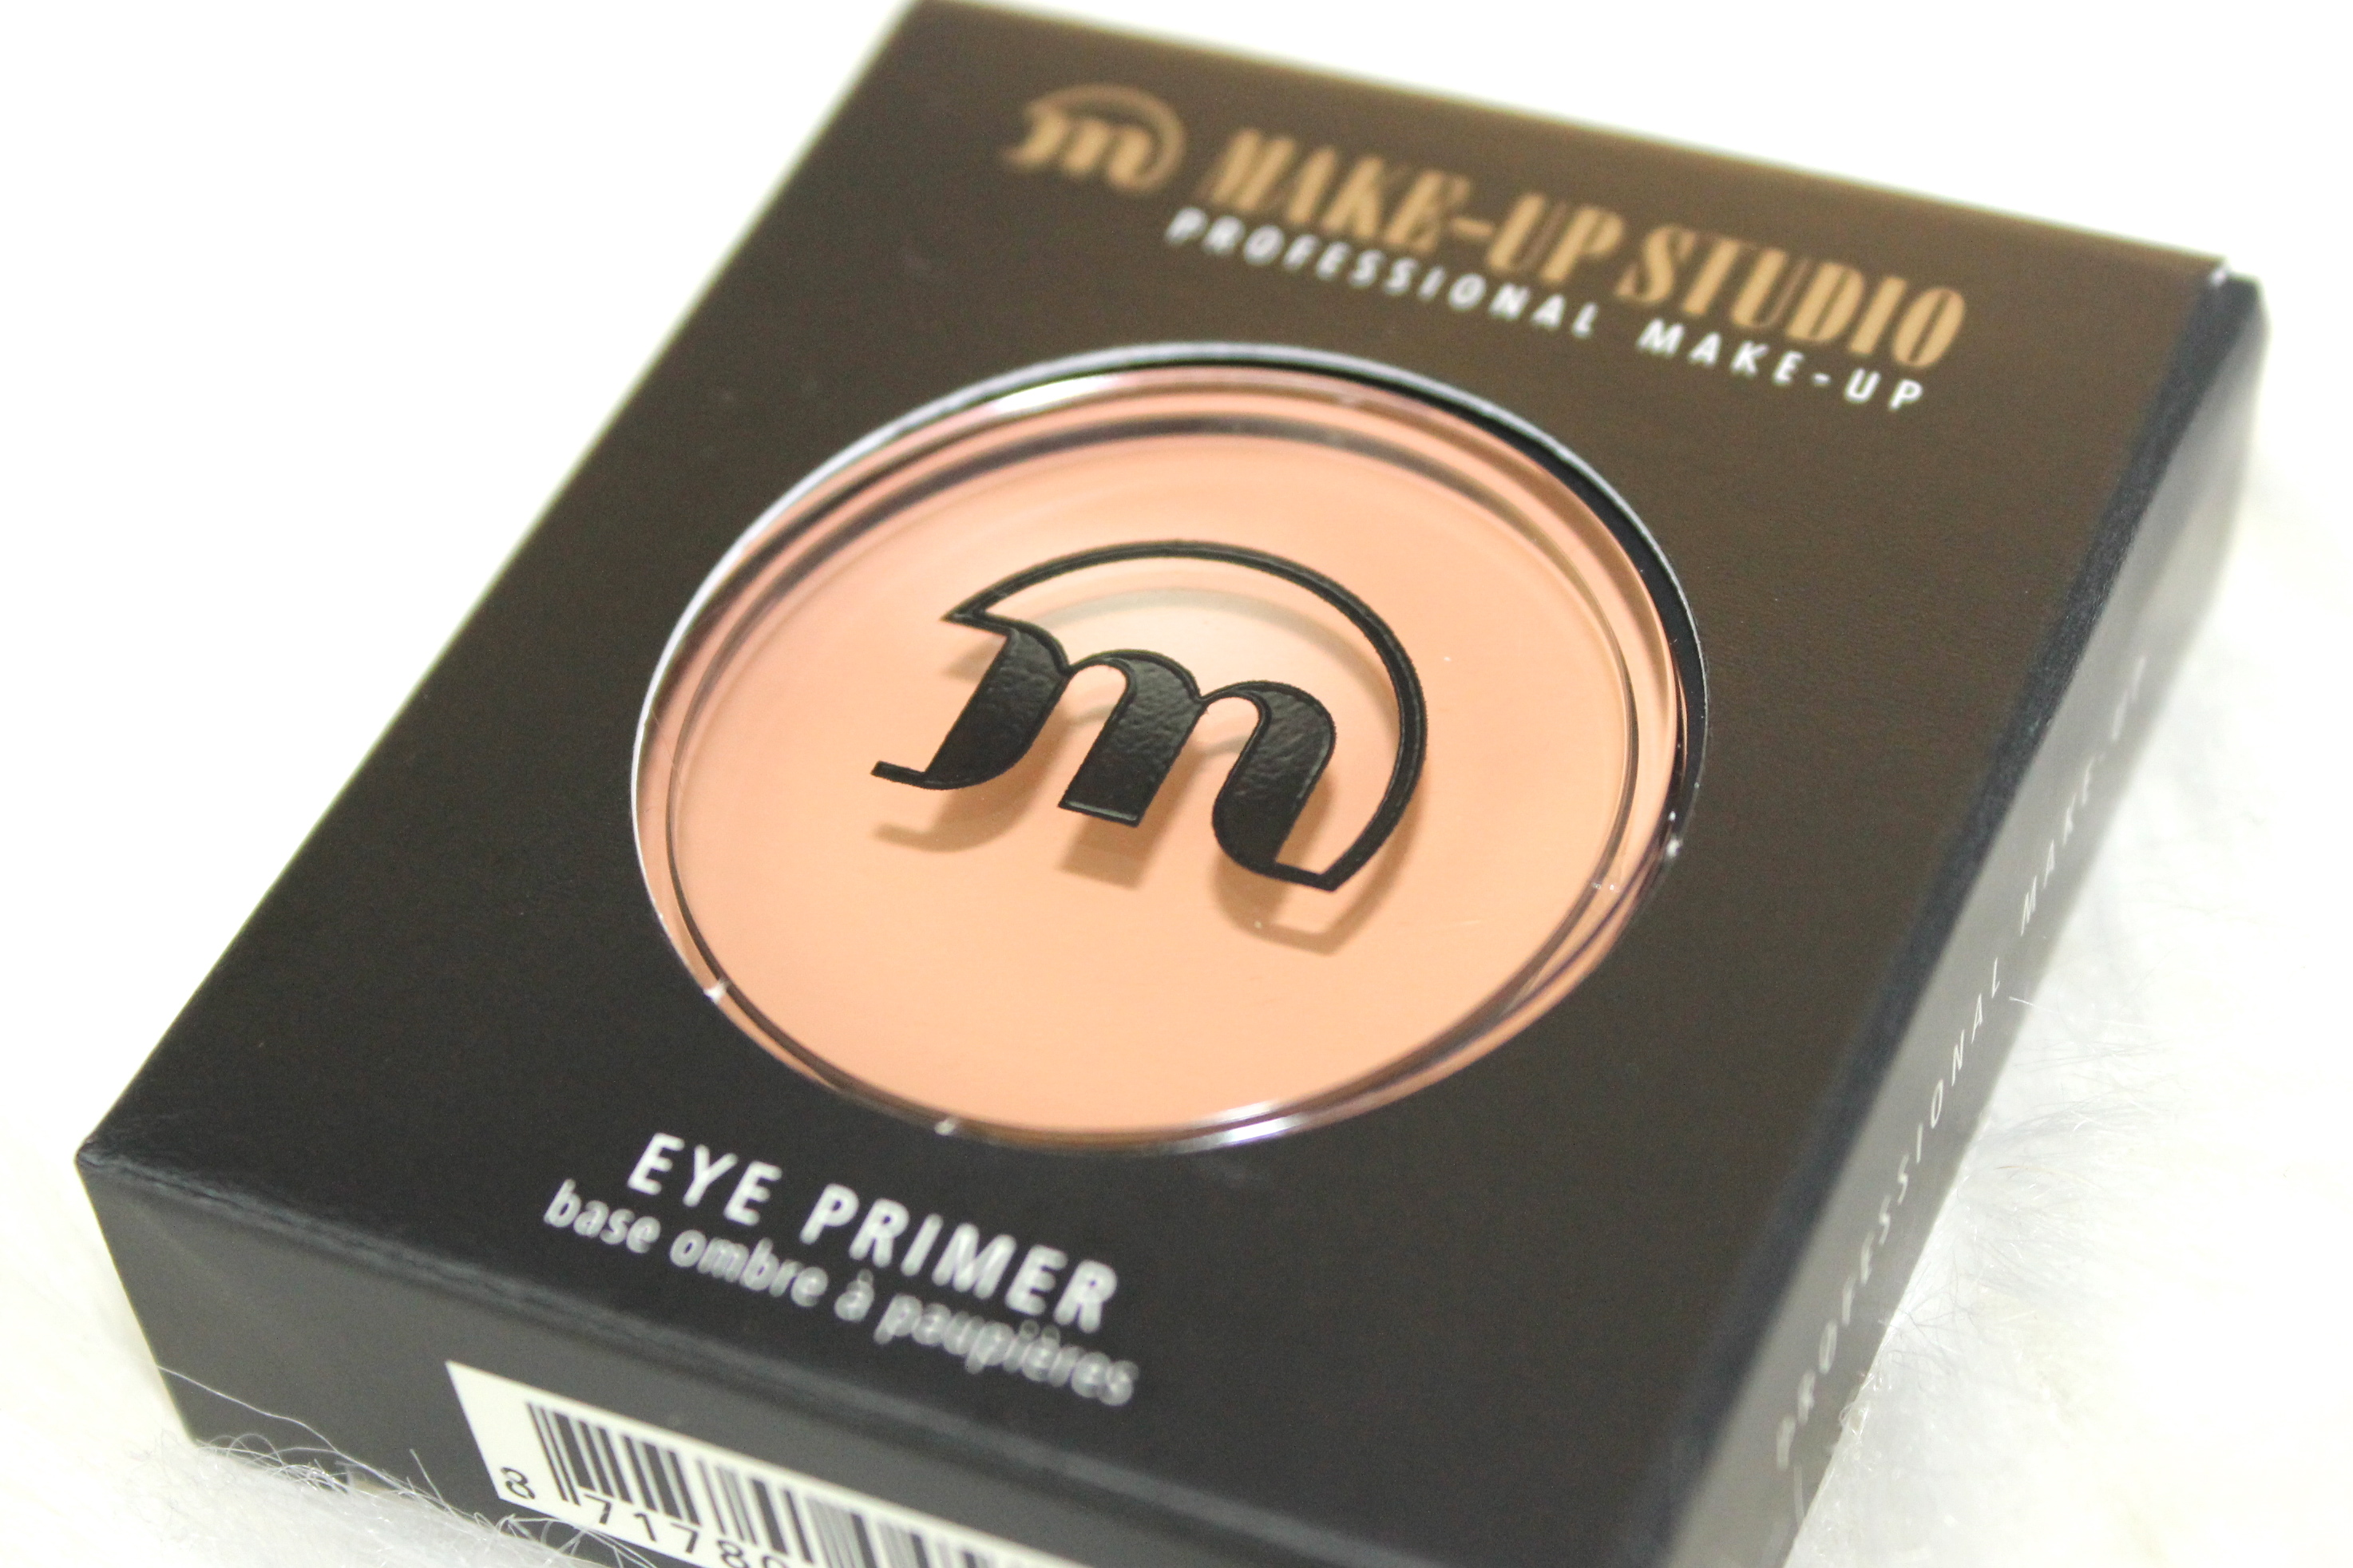 Make-up Studieo eye primer review 1